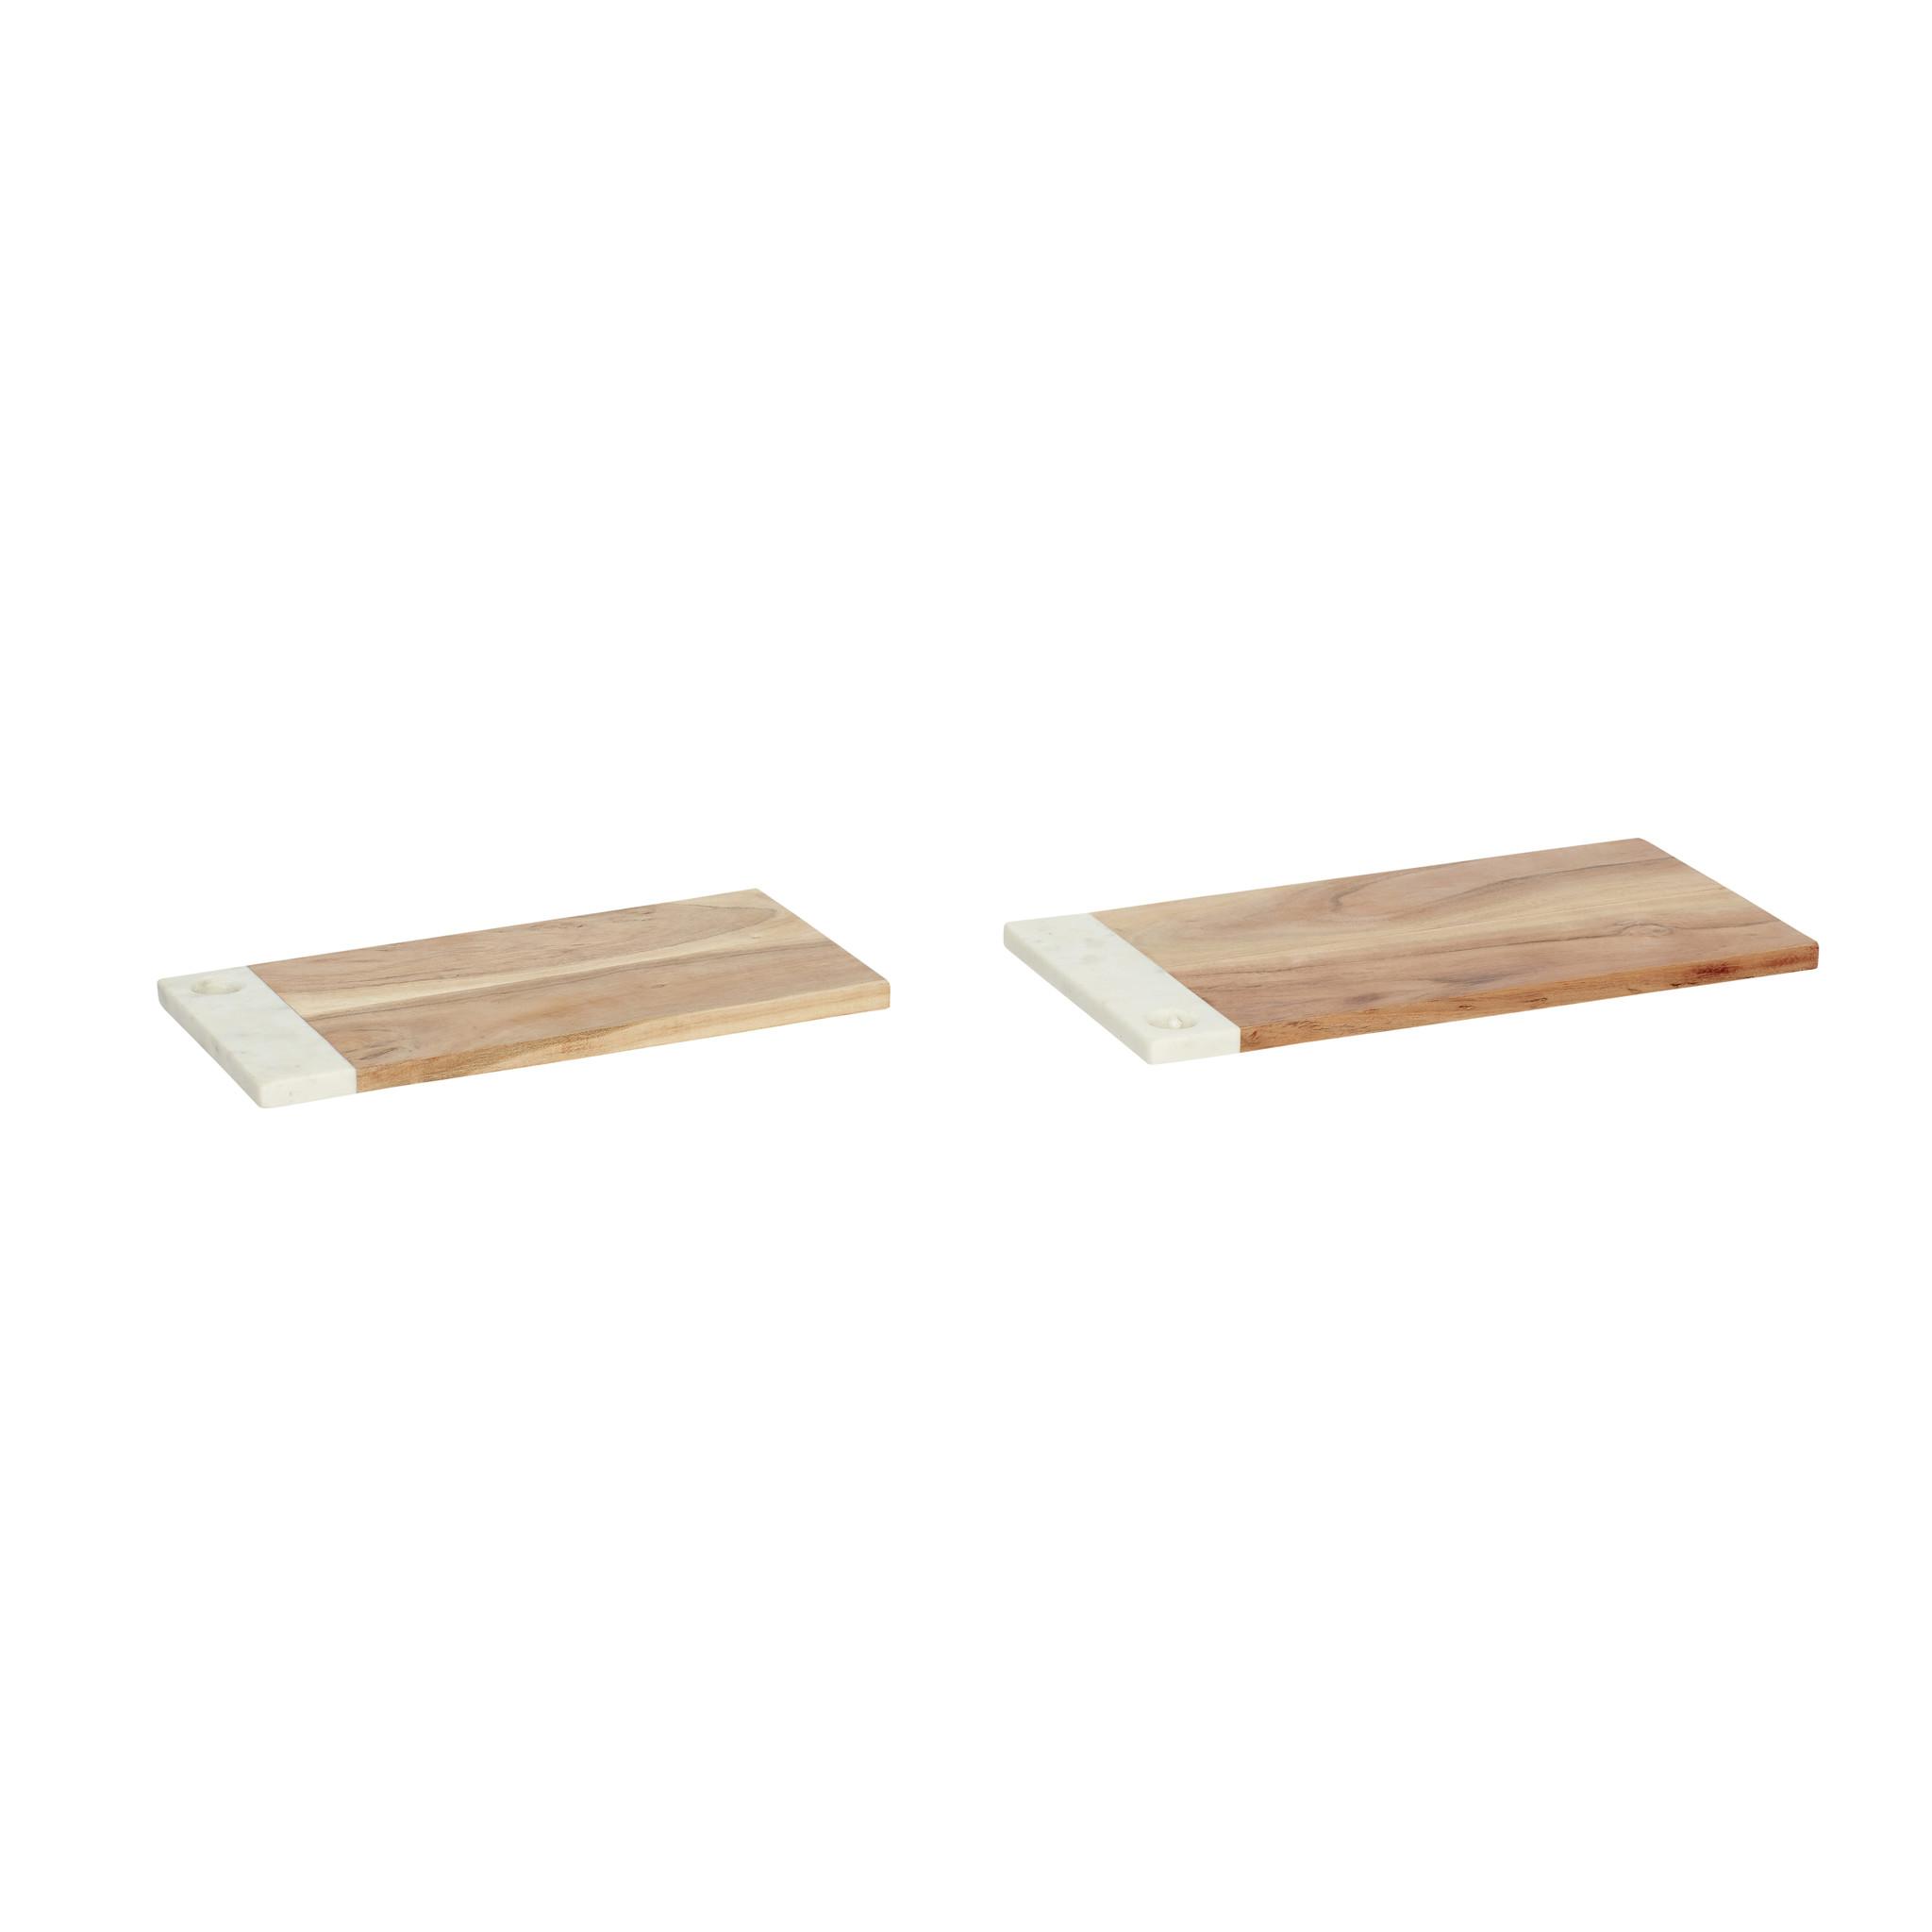 Hubsch Boord, hout / marmer, natuur / wit, set van 2